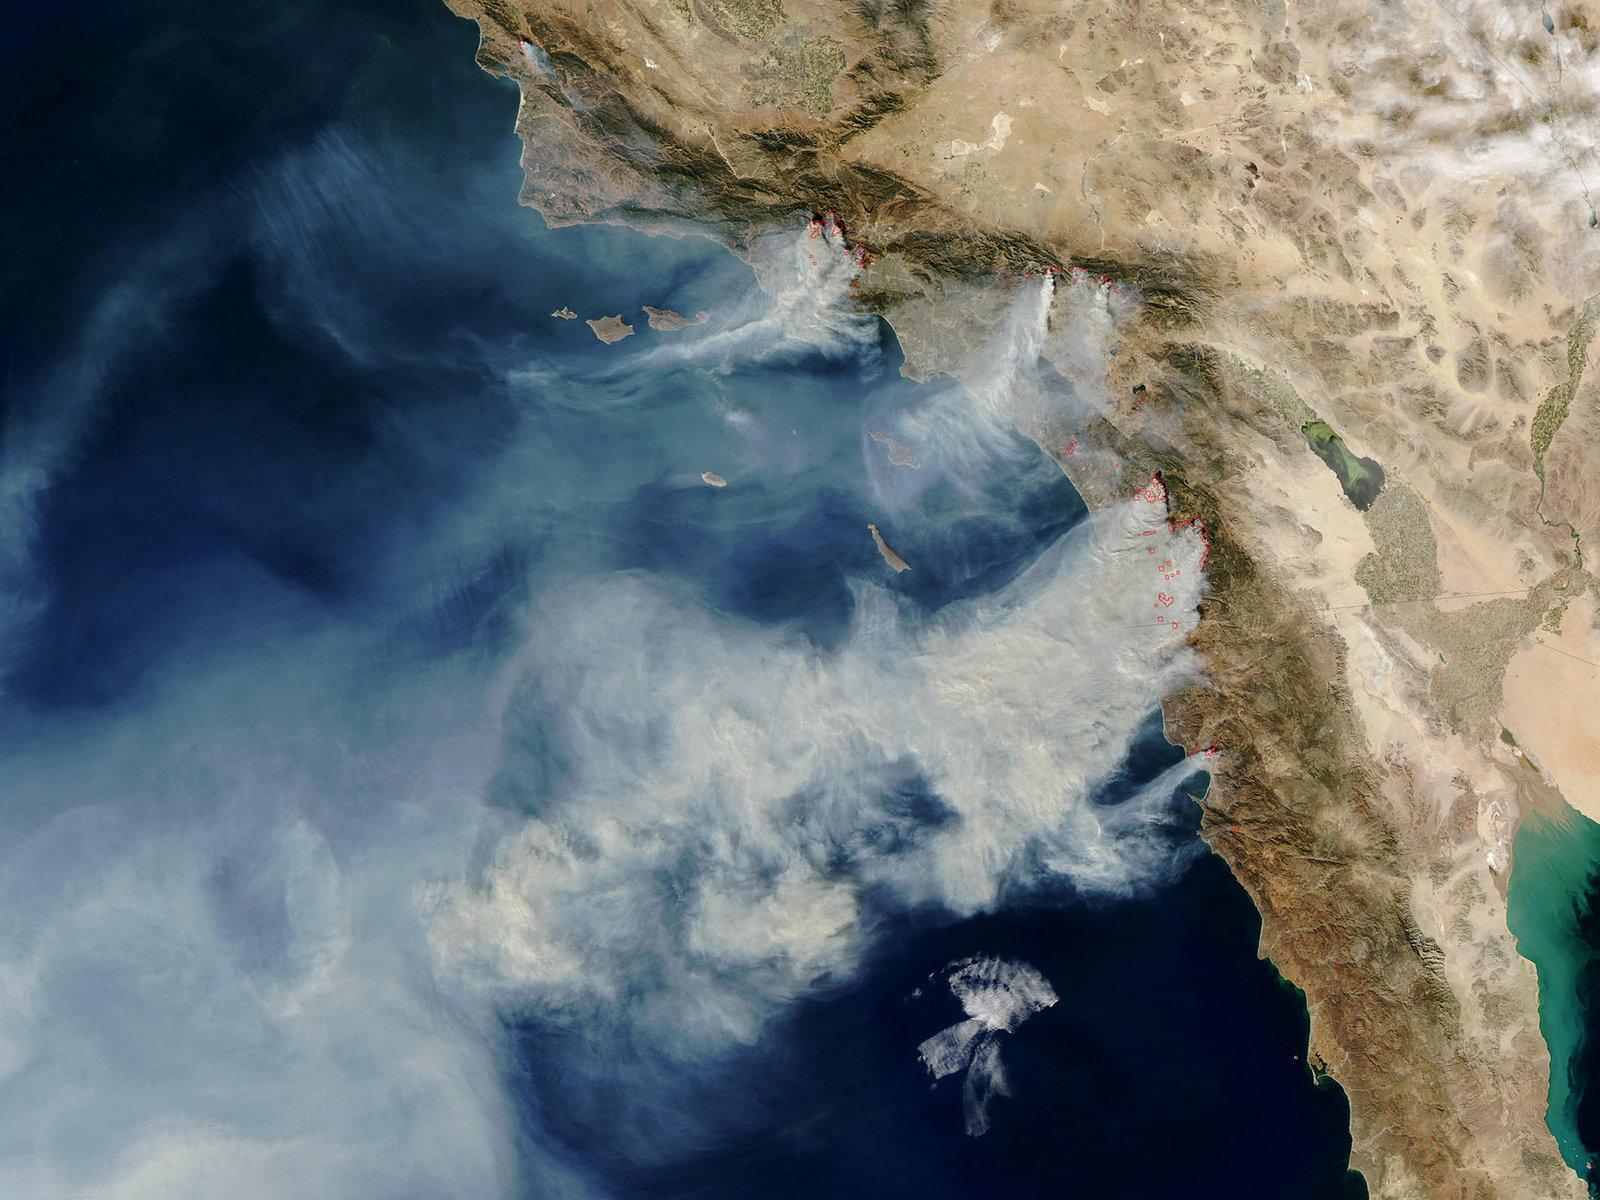 Ten wildfires burn over 200,000 acres in Southern California, Oct 2003 - MODIS image, NASA